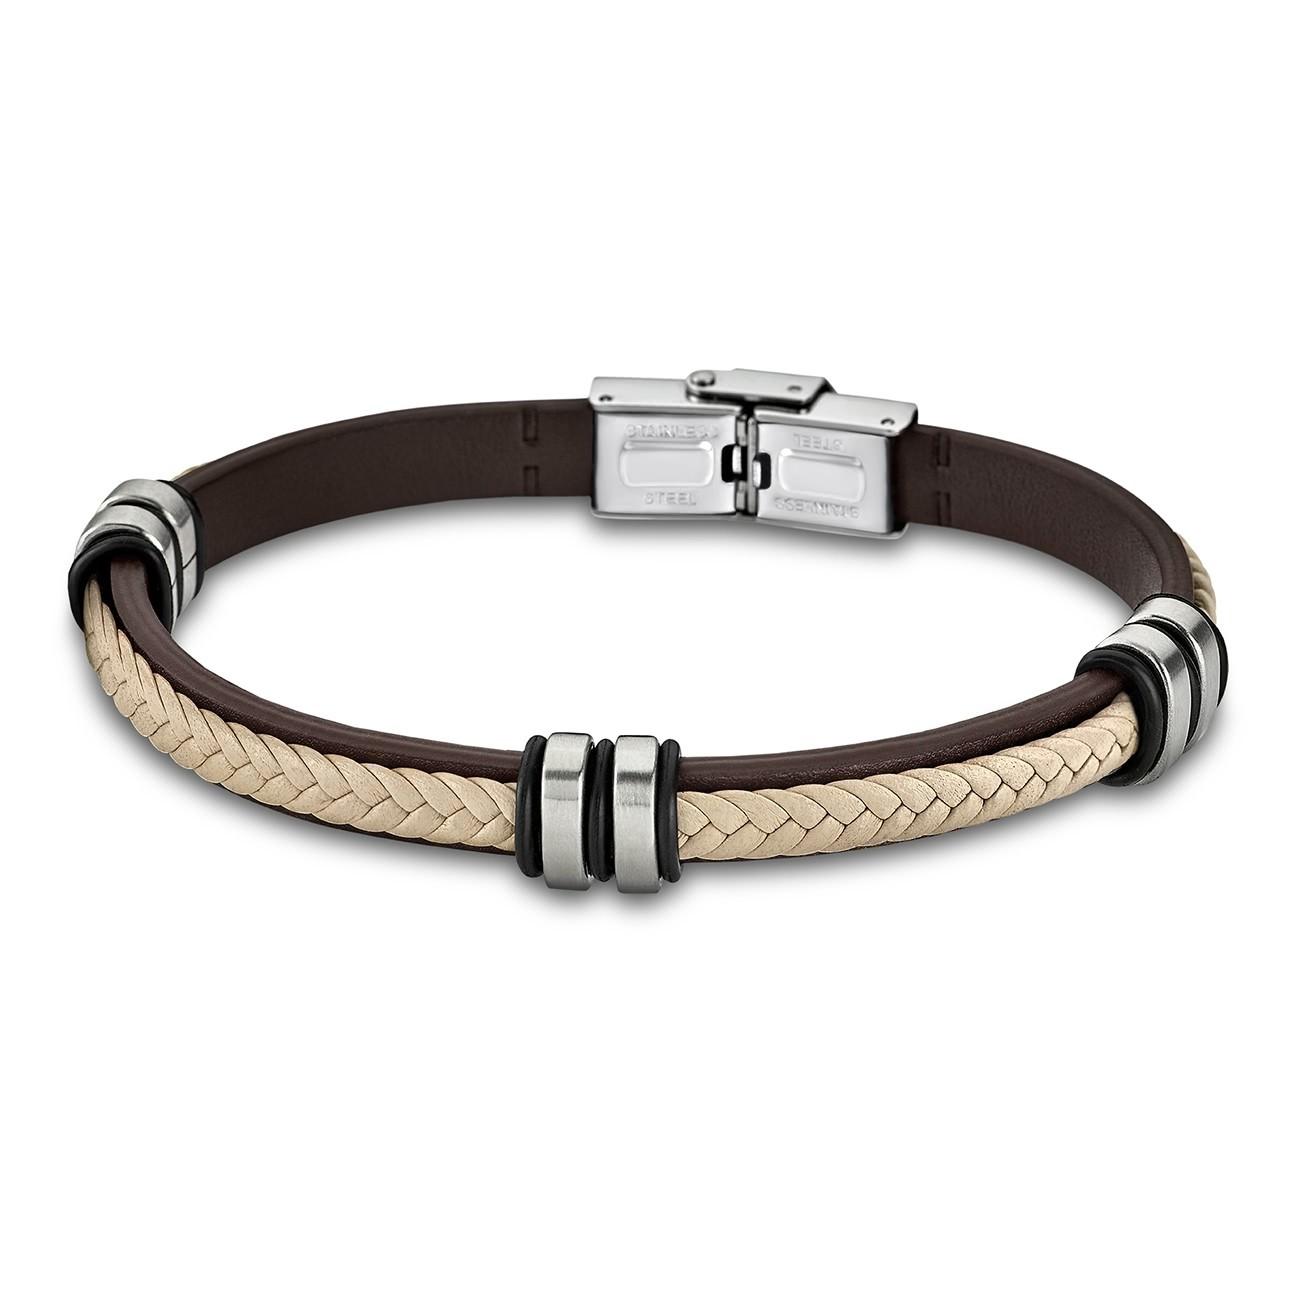 LOTUS Style Armband Damen Herren LS1829-2/6 Leder braun beige JLS1829-2-6